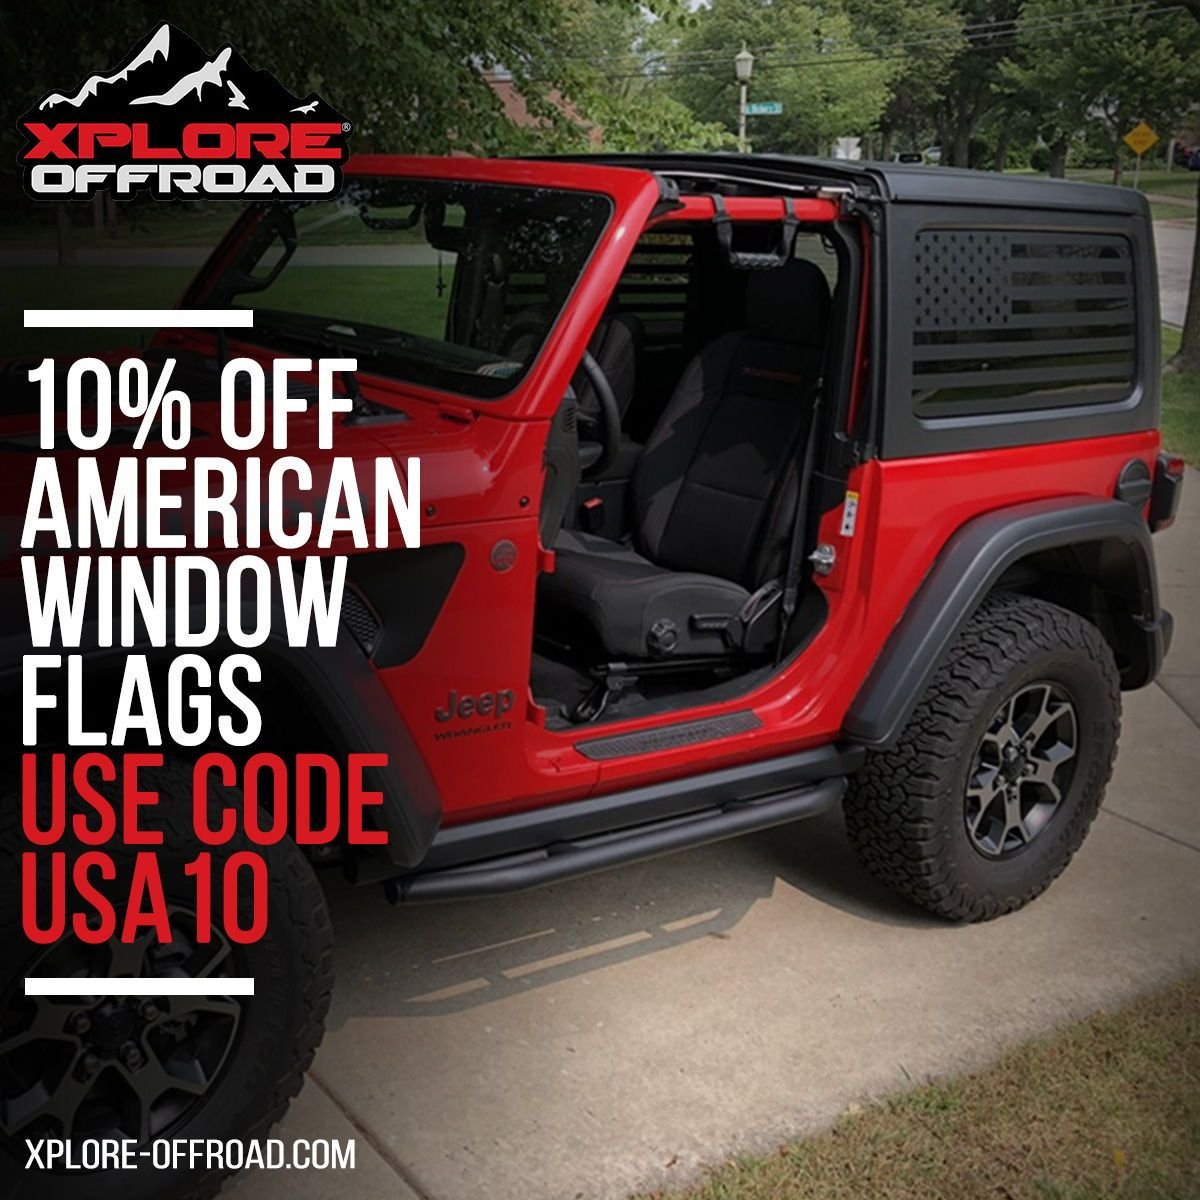 2 Door Precut USA Flag Window Decals XPLORE OFFROAD® Jeep Wrangler XPLORE OFFROAD Matte Black American Vinyl for Rear Side Windows Both Sides JKU 2011-2017